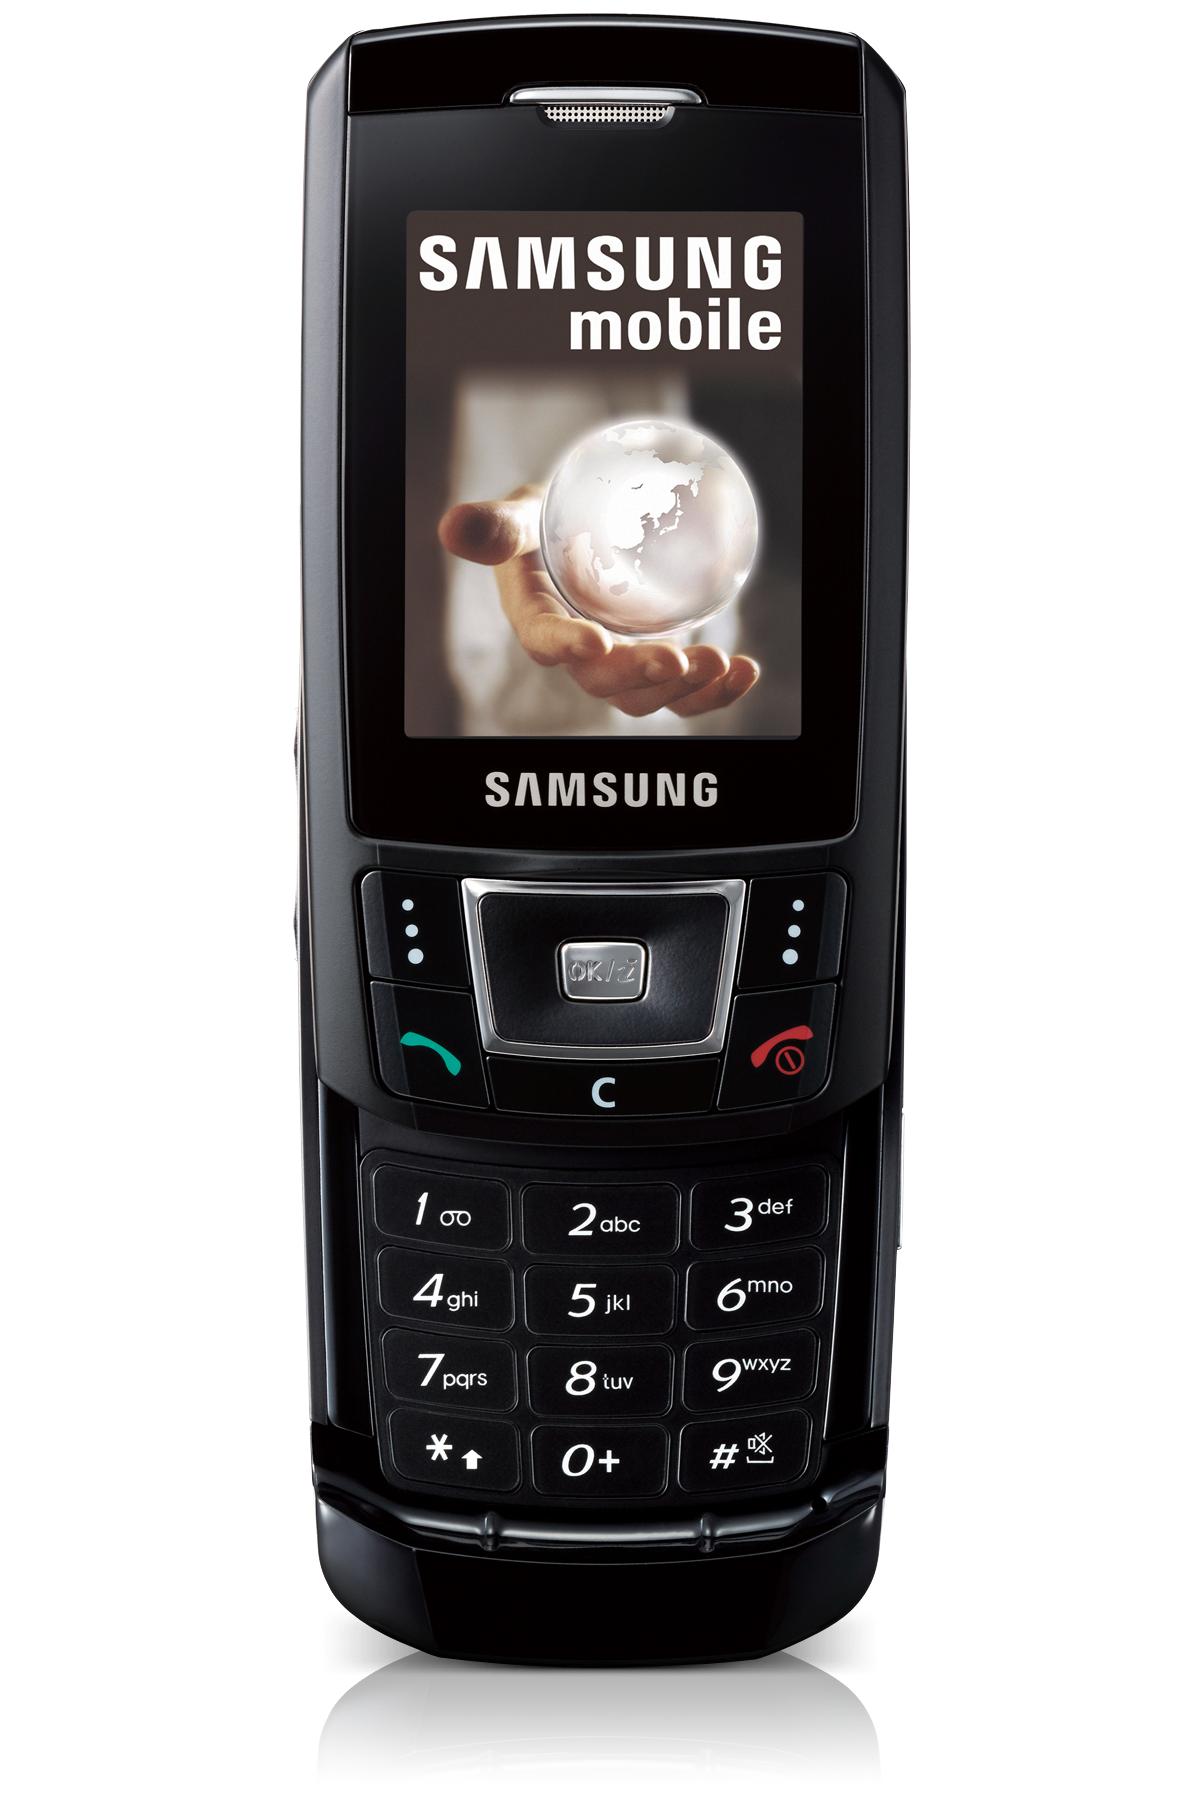 whatsapp for d900i